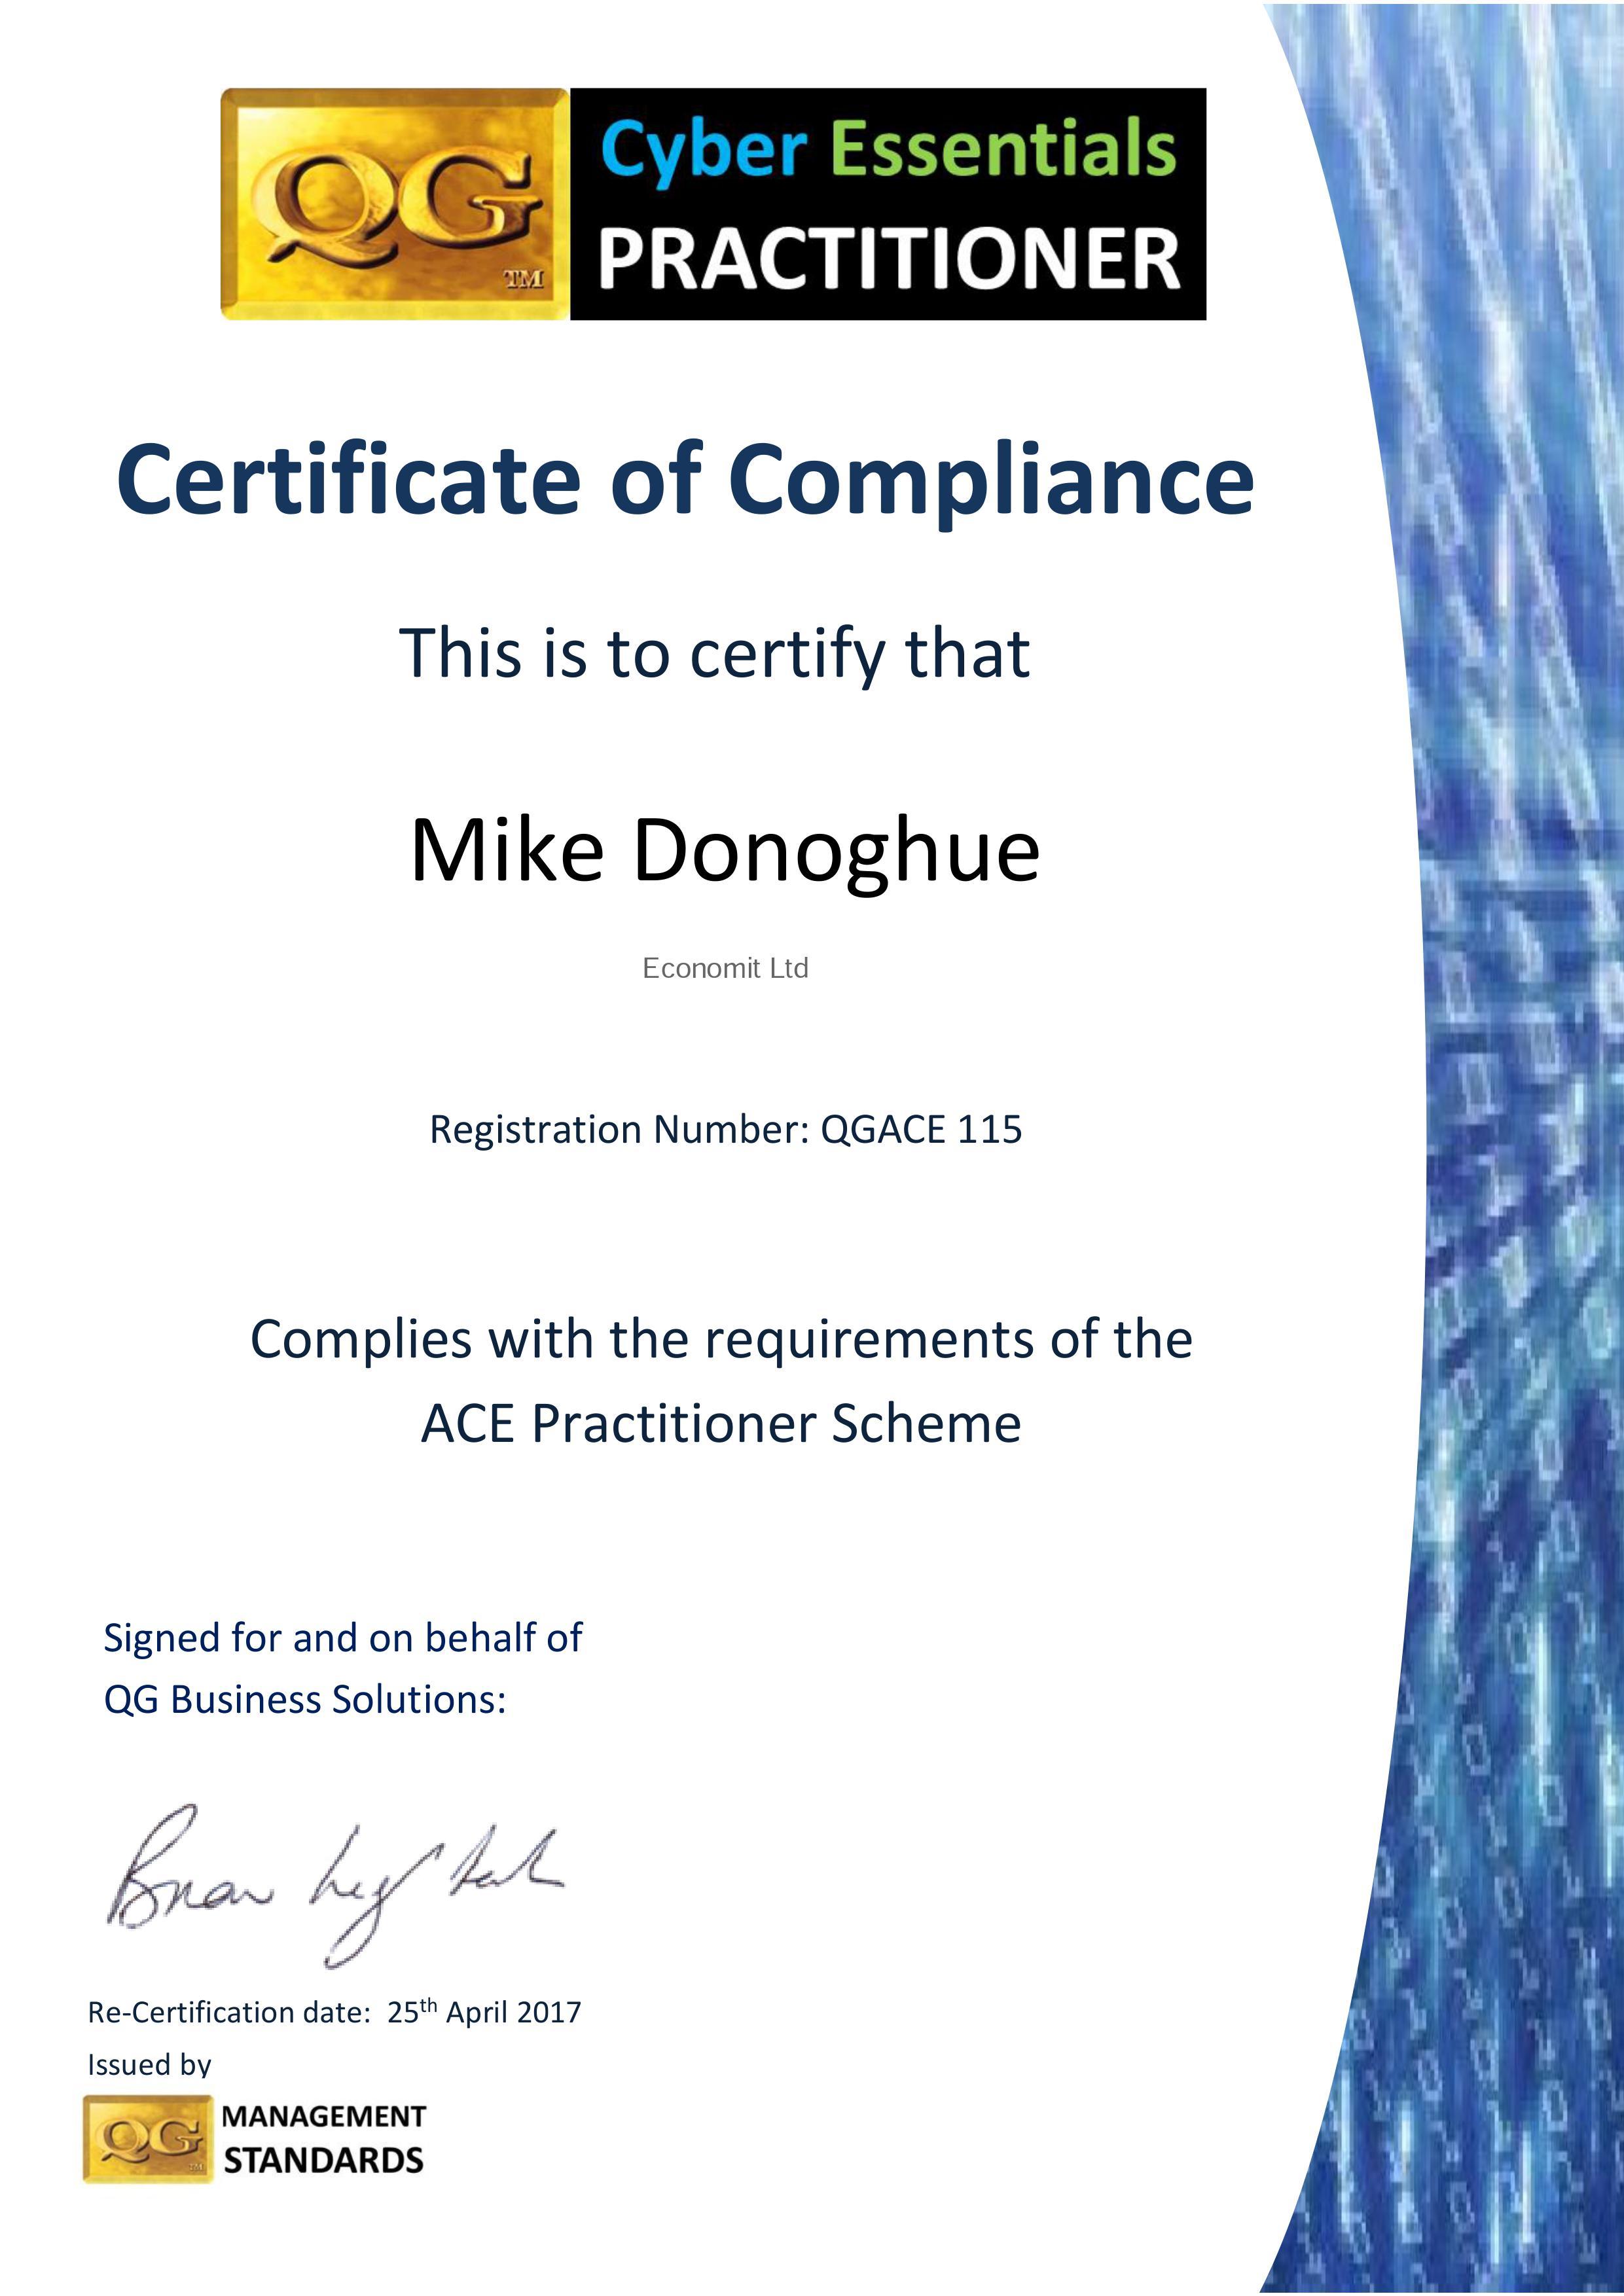 QGACE115 Mike Donoghue